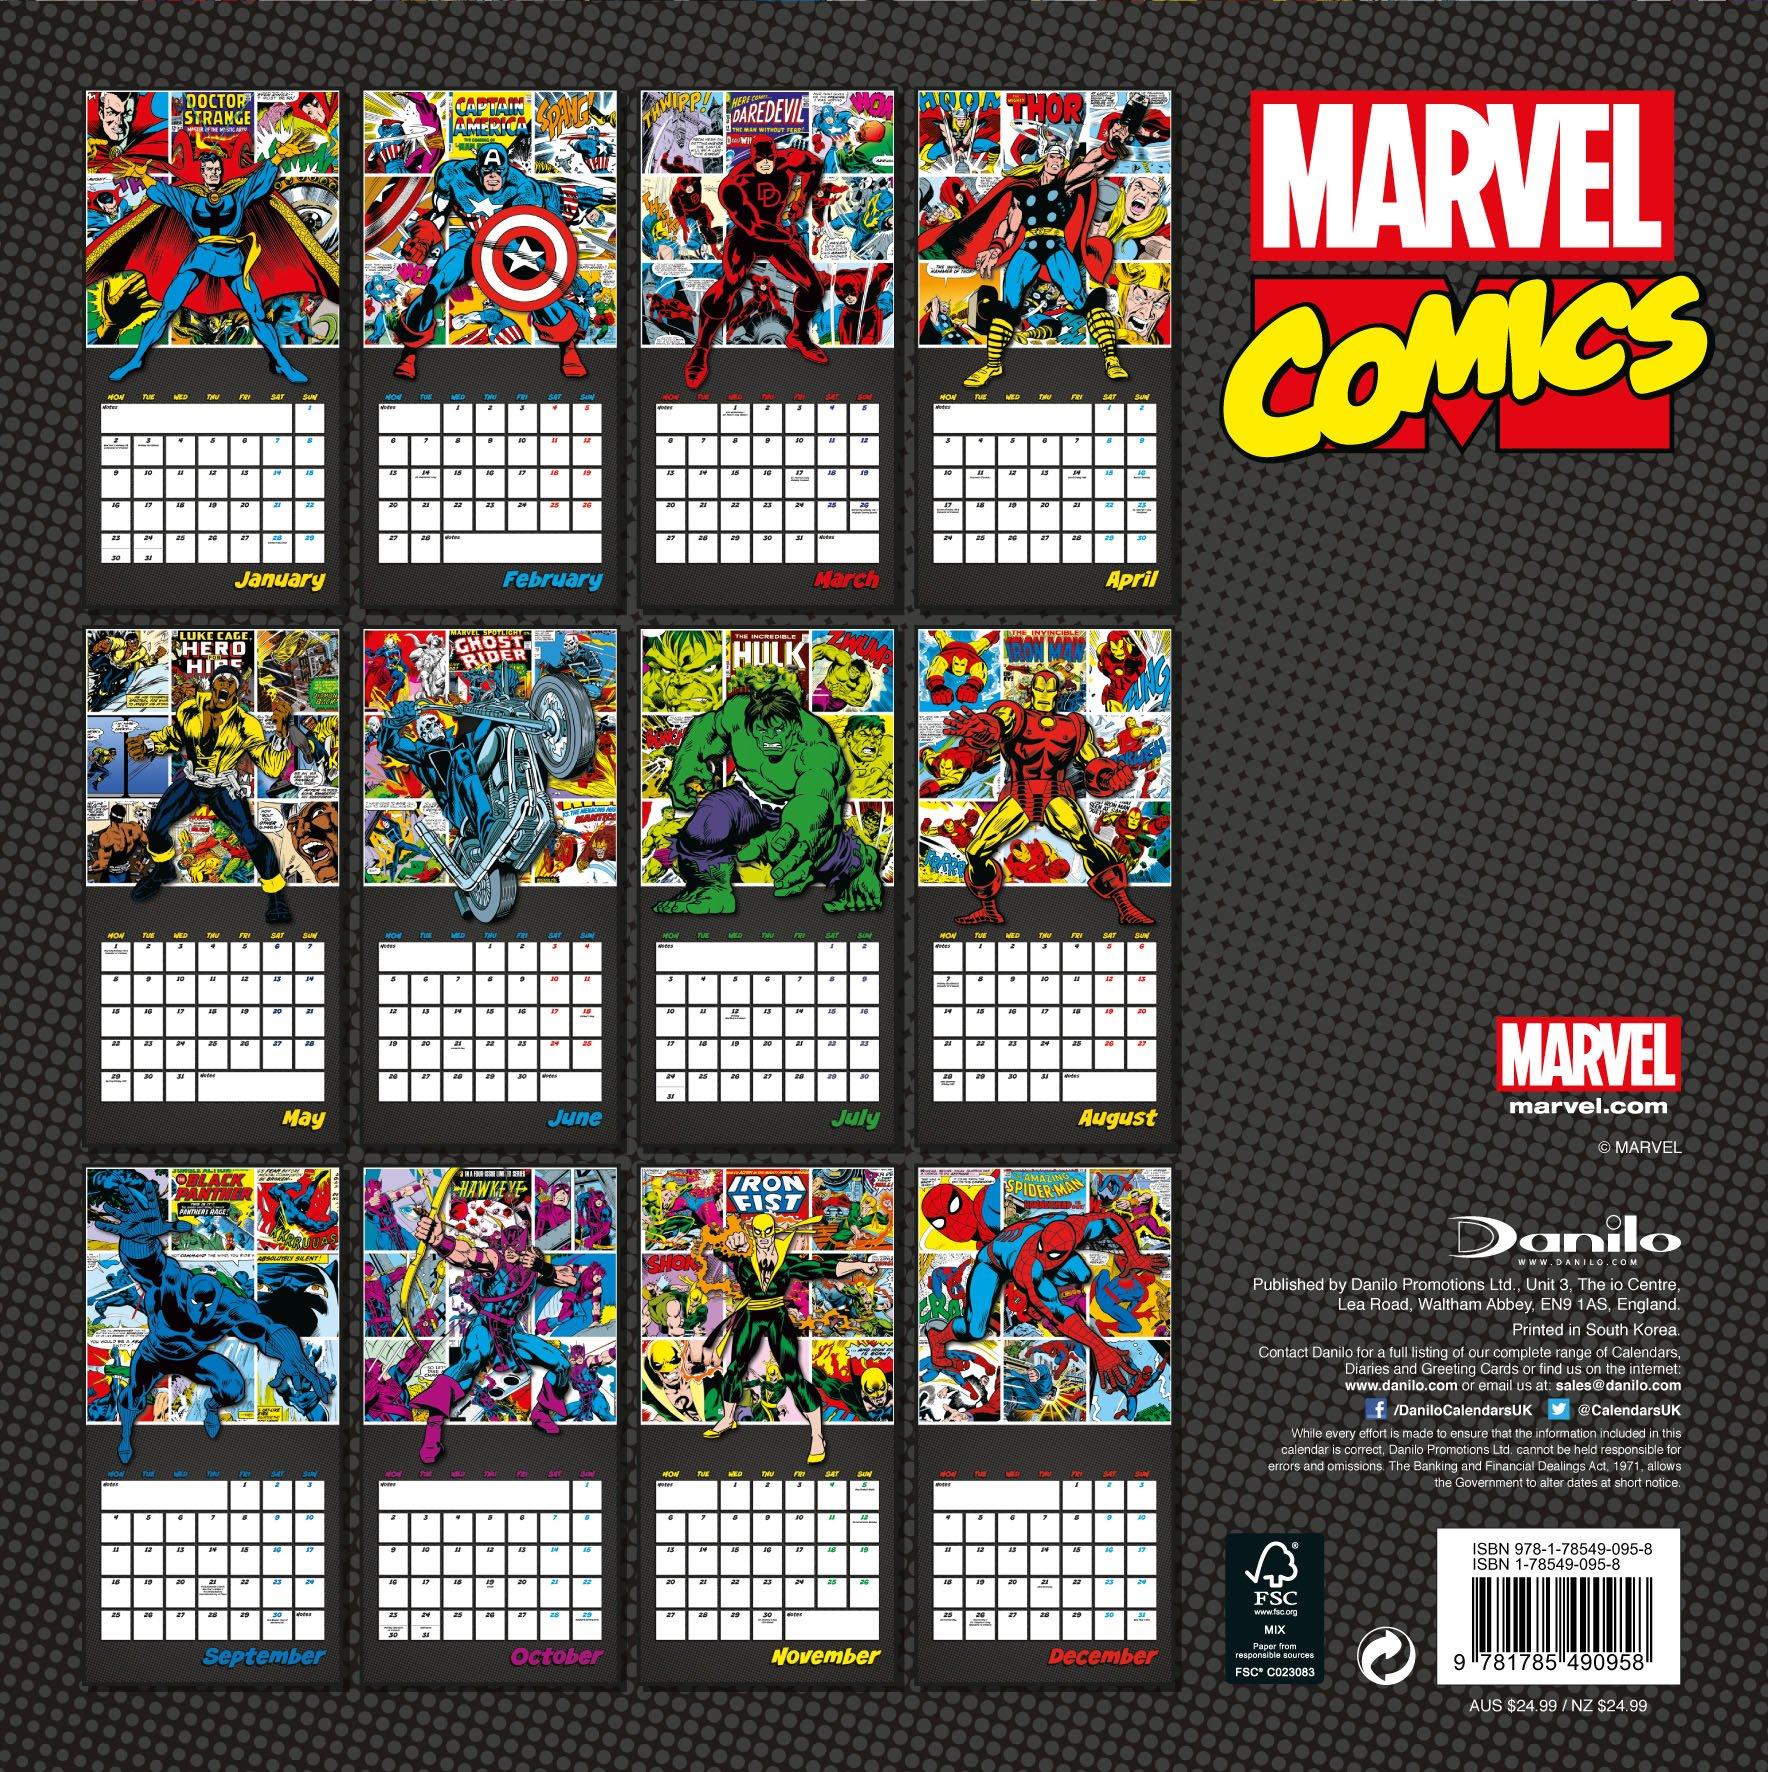 Marvel Comics Classic Official 2017 Calendar   Superhero Square